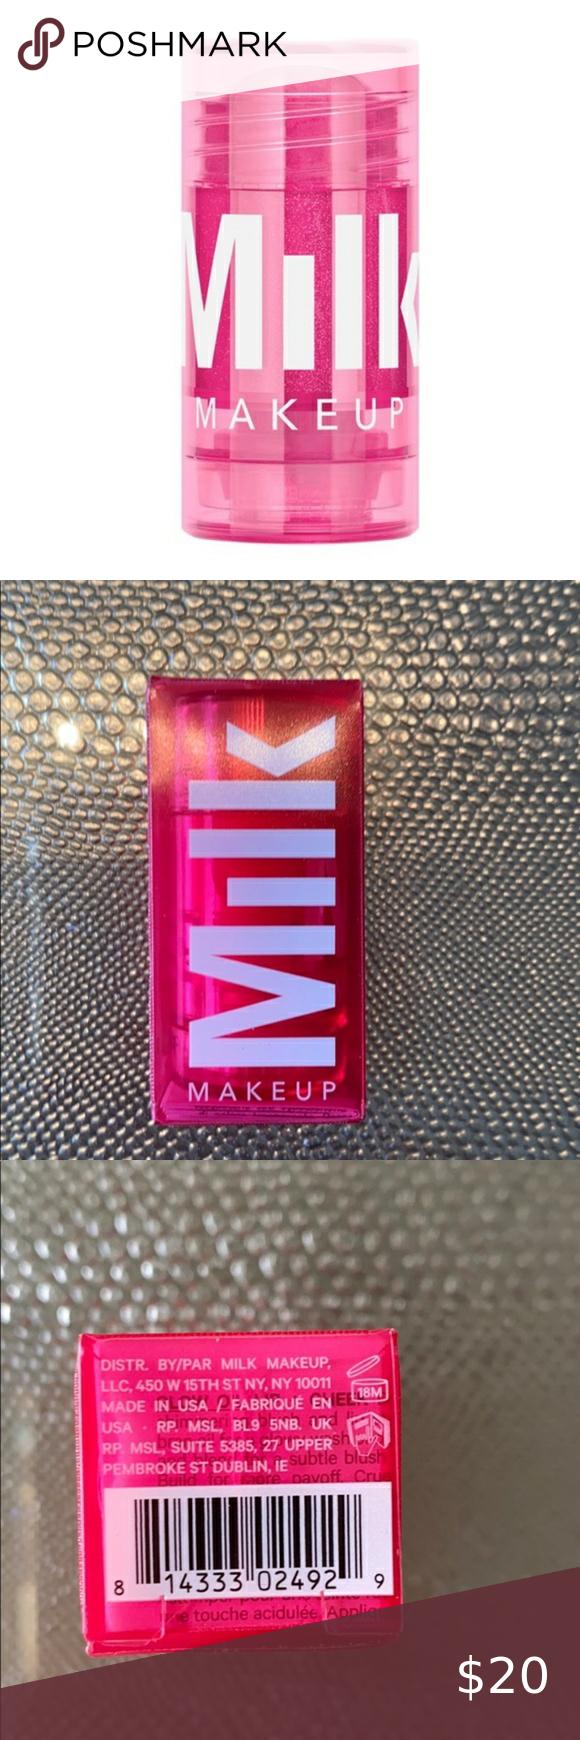 2 Milk Makeup Glow Oils for Lip & Cheek Halo Flare Set of